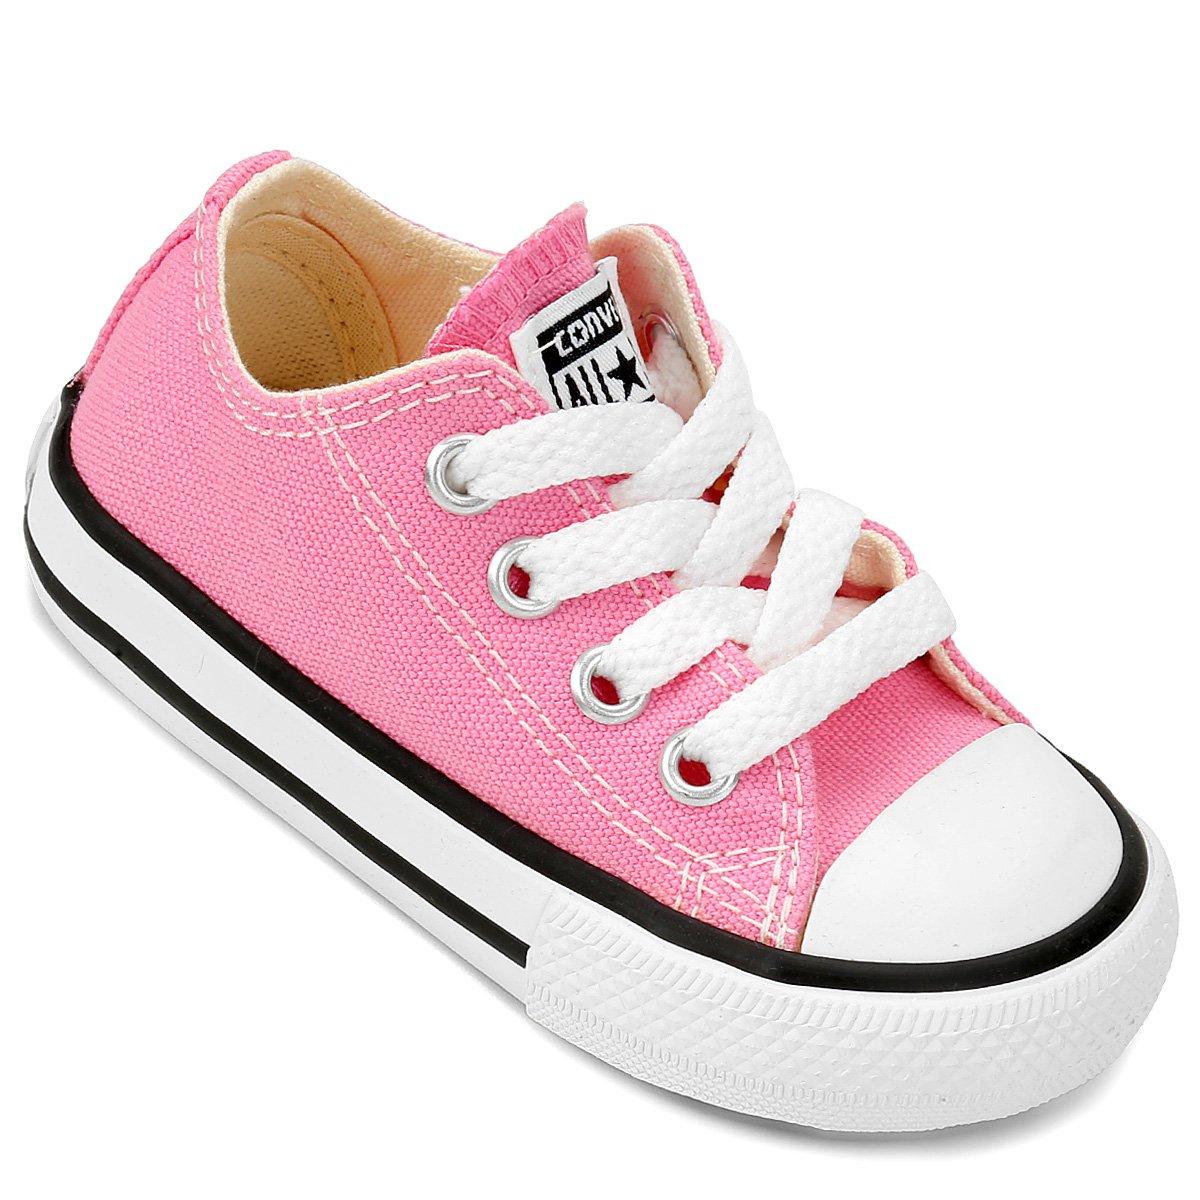 661f92fe03 comprar all star converse infantil